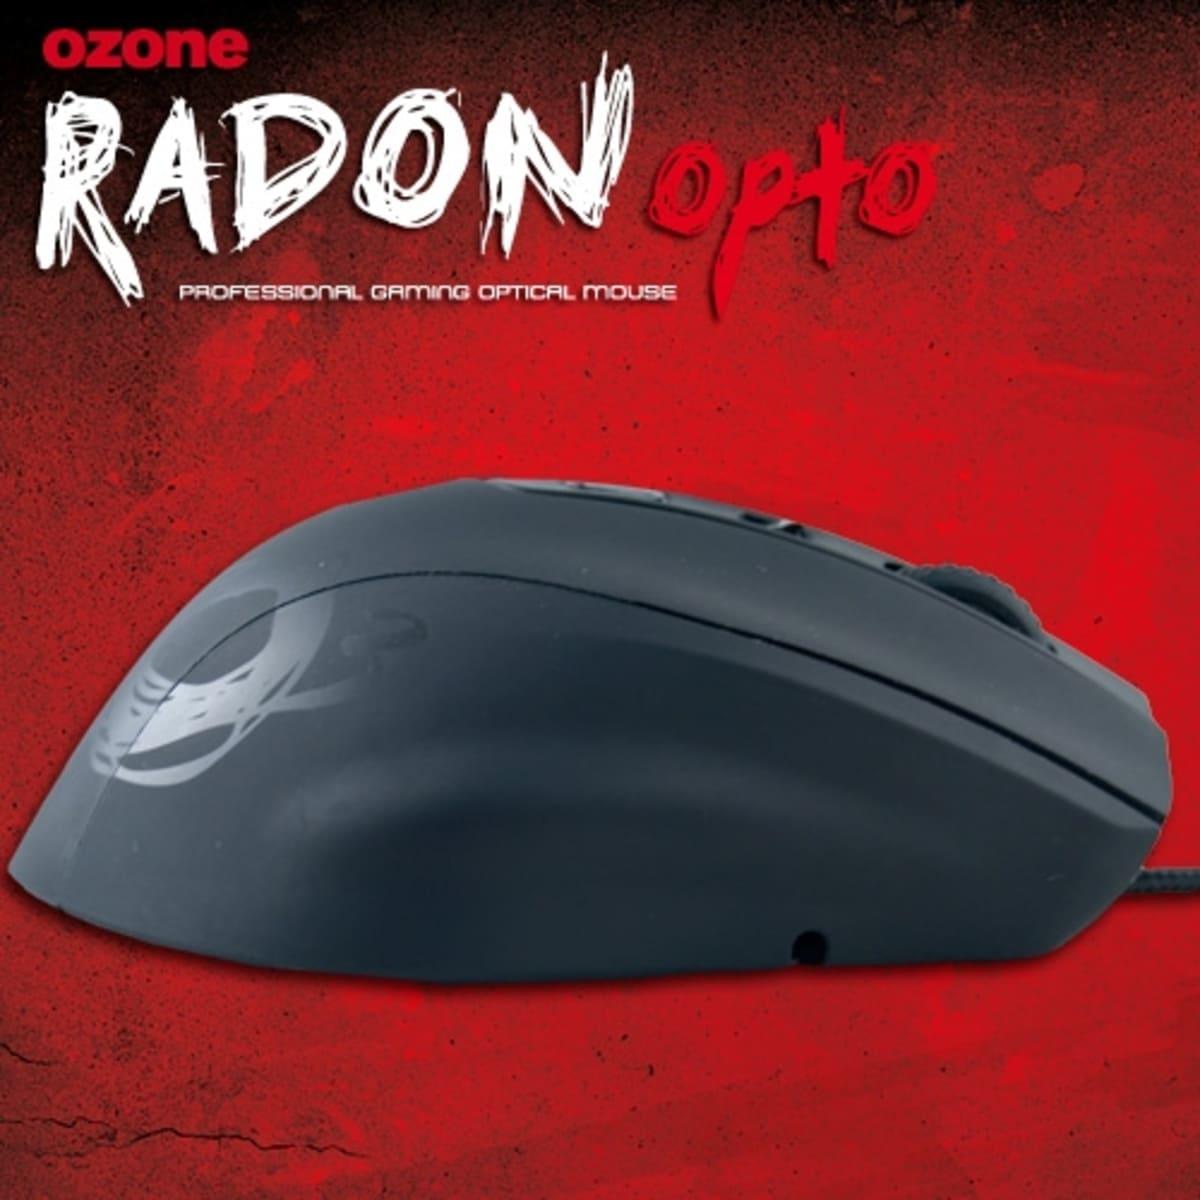 Ozone Gaming Radon Opto 6 3